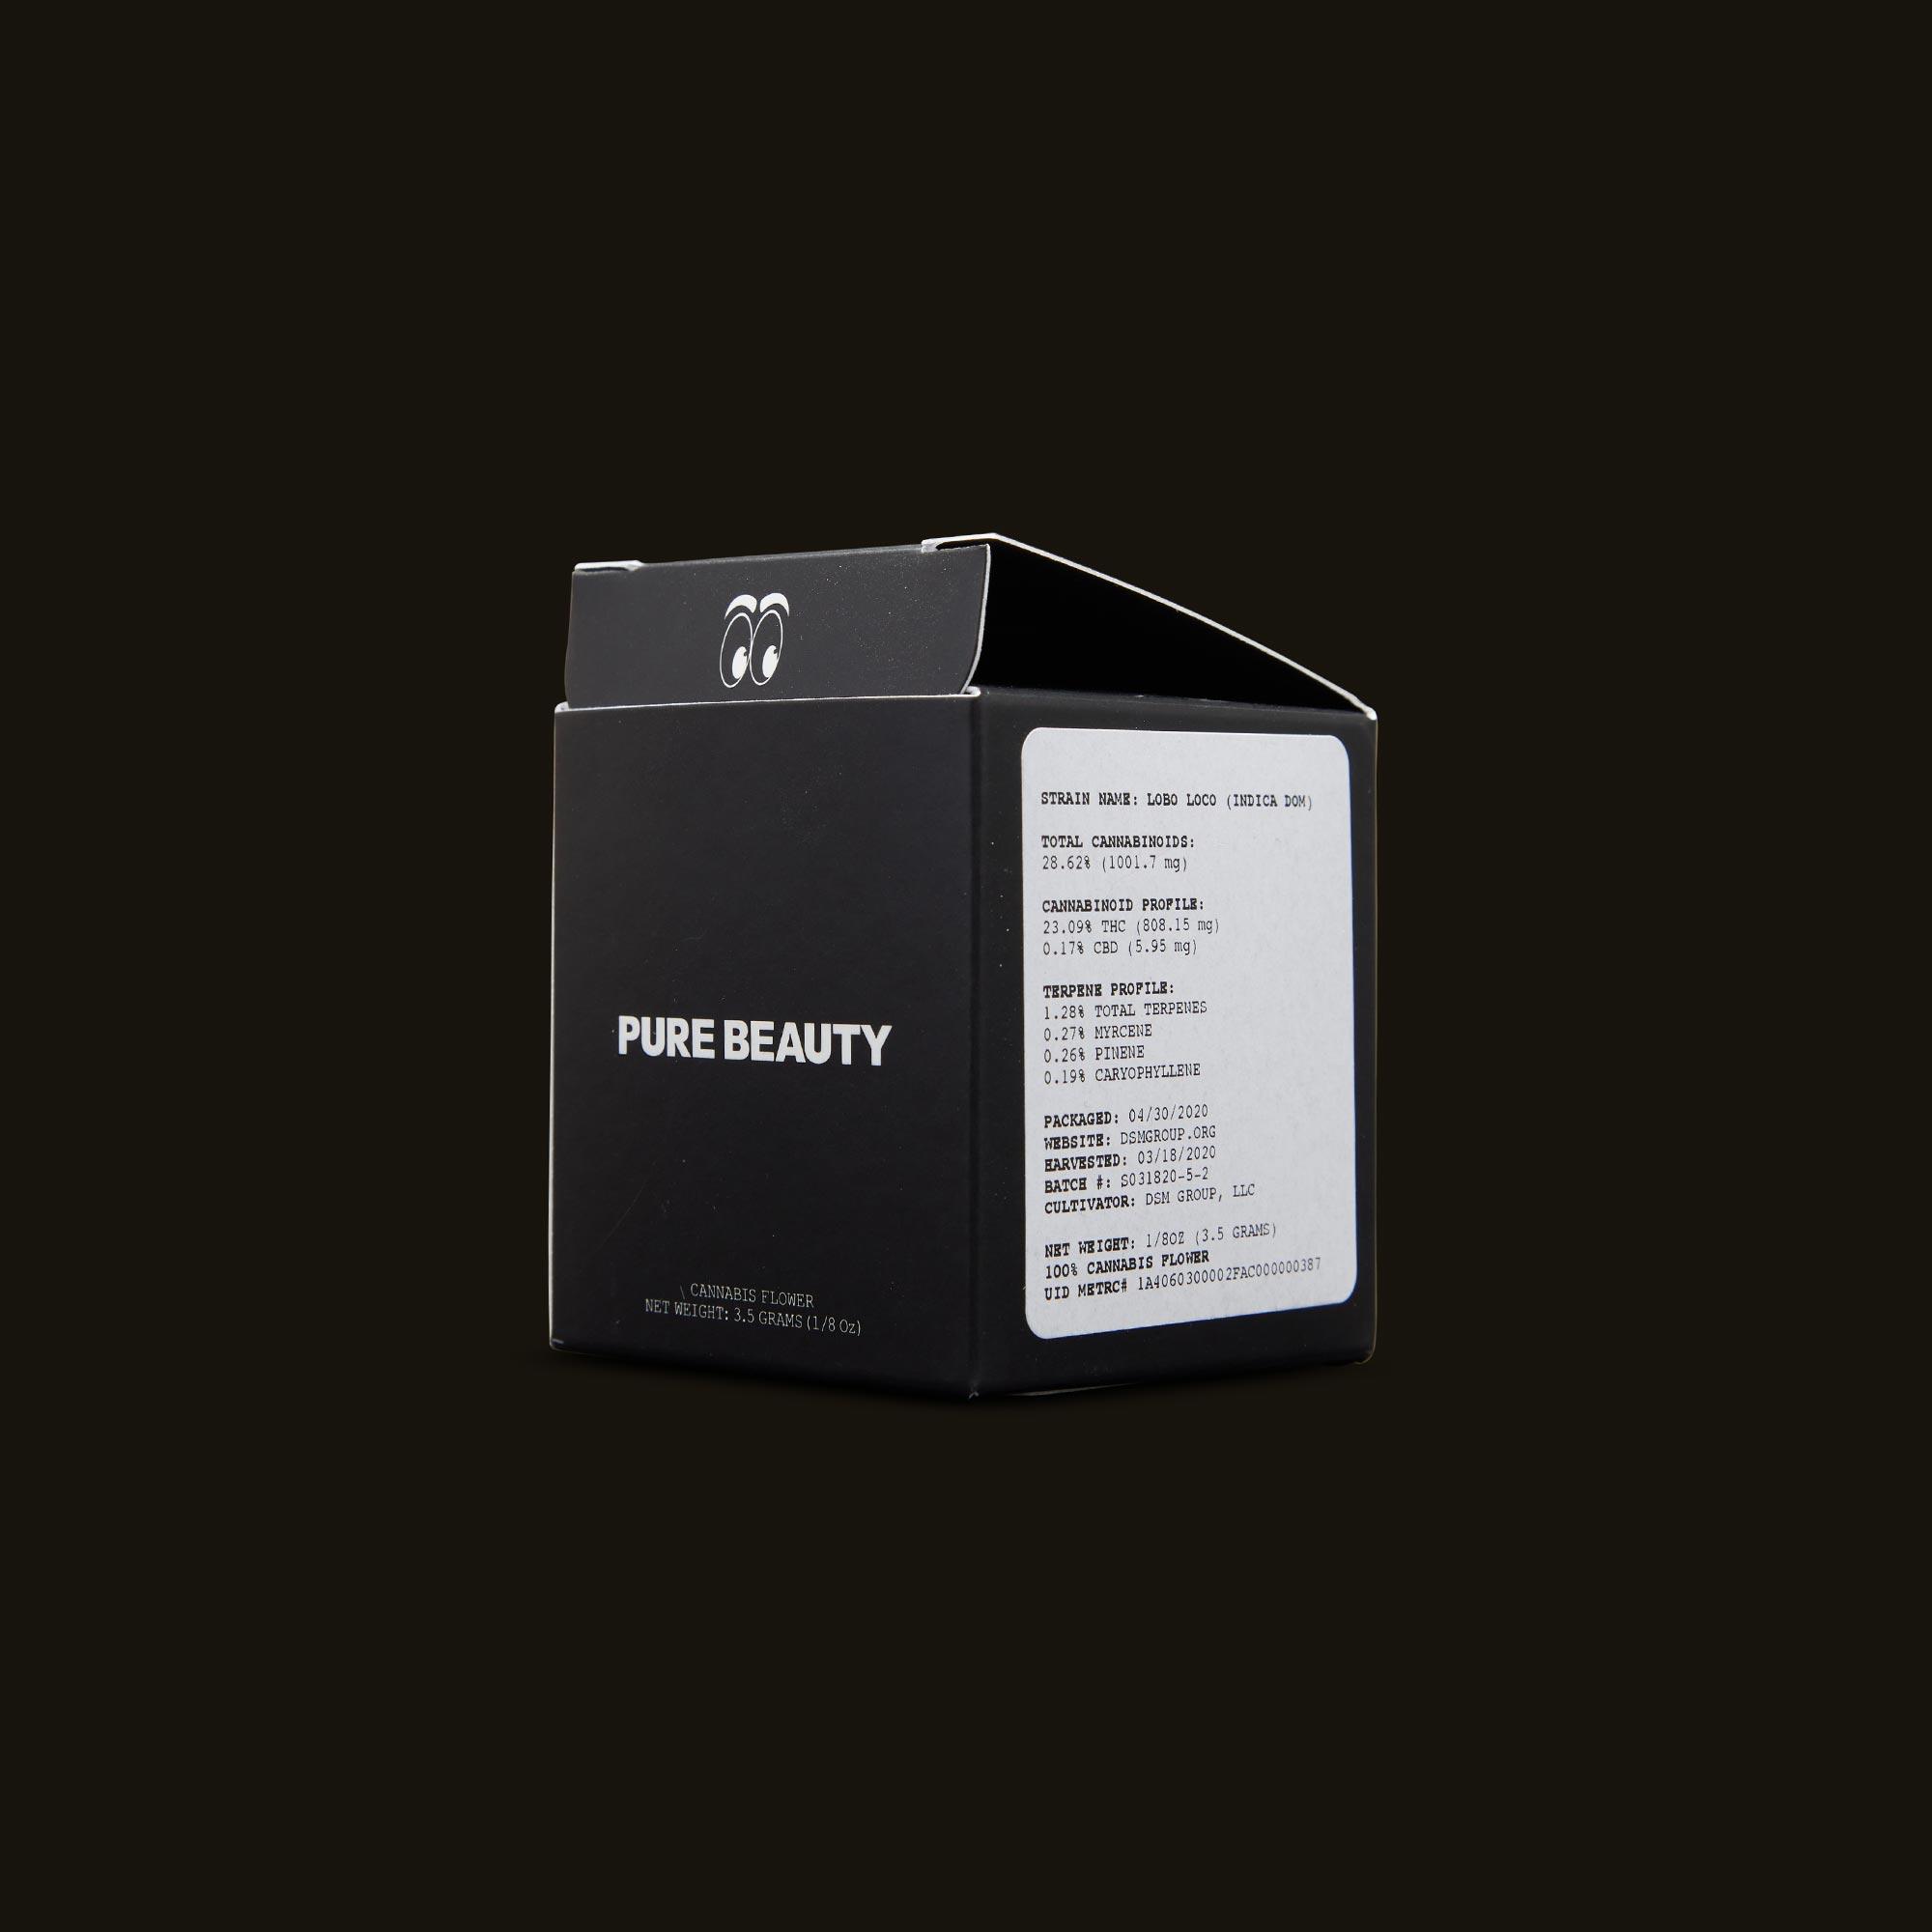 Pure Beauty Lobo Loco Side Box